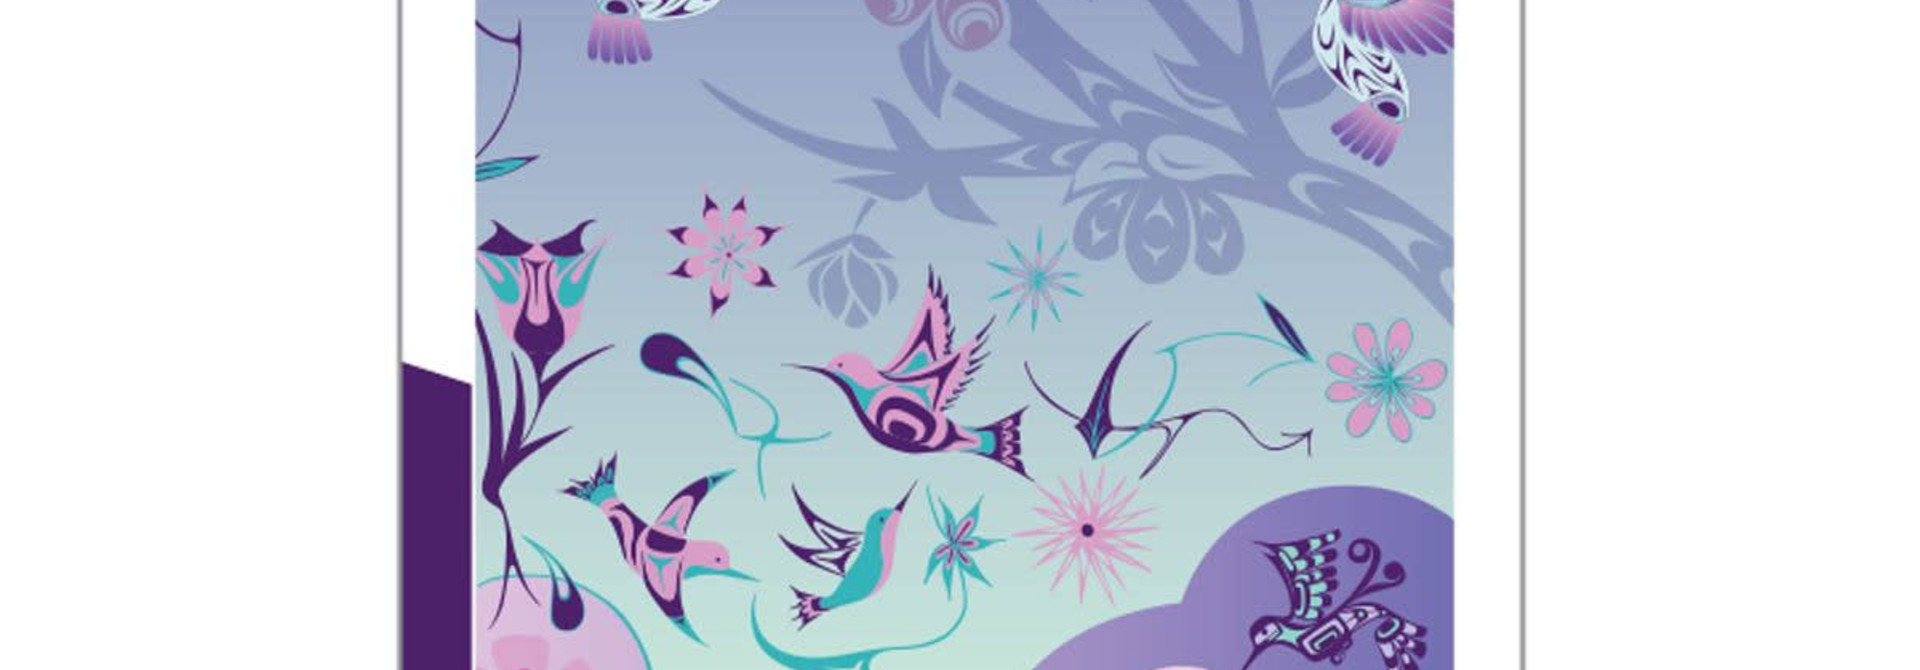 1000 pcs Puzzle - Hummingbirds - Various Artists